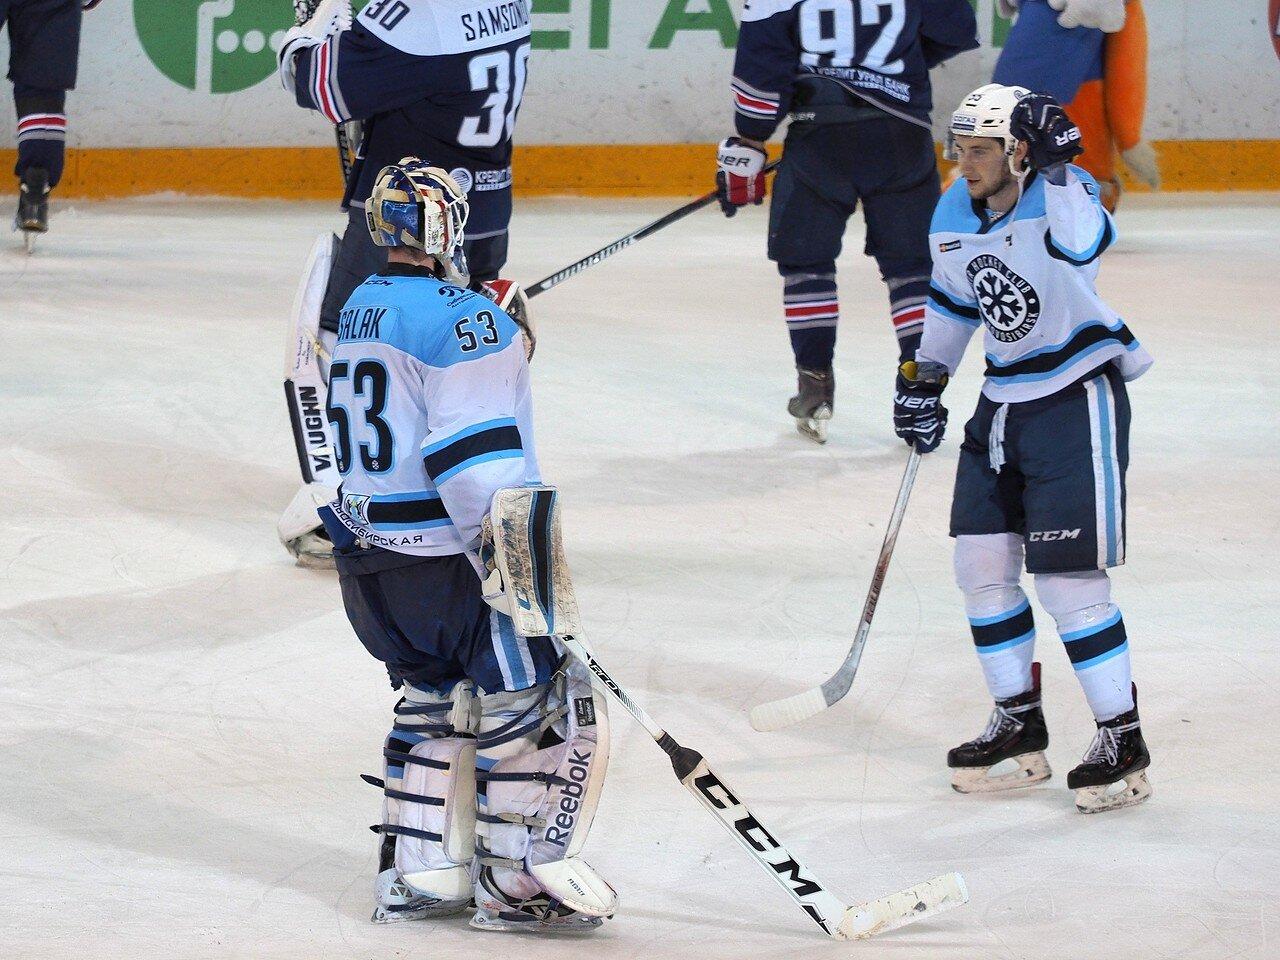 115Плей-офф 2016 Восток 1/2 Металлург - Сибирь 10.03.2016